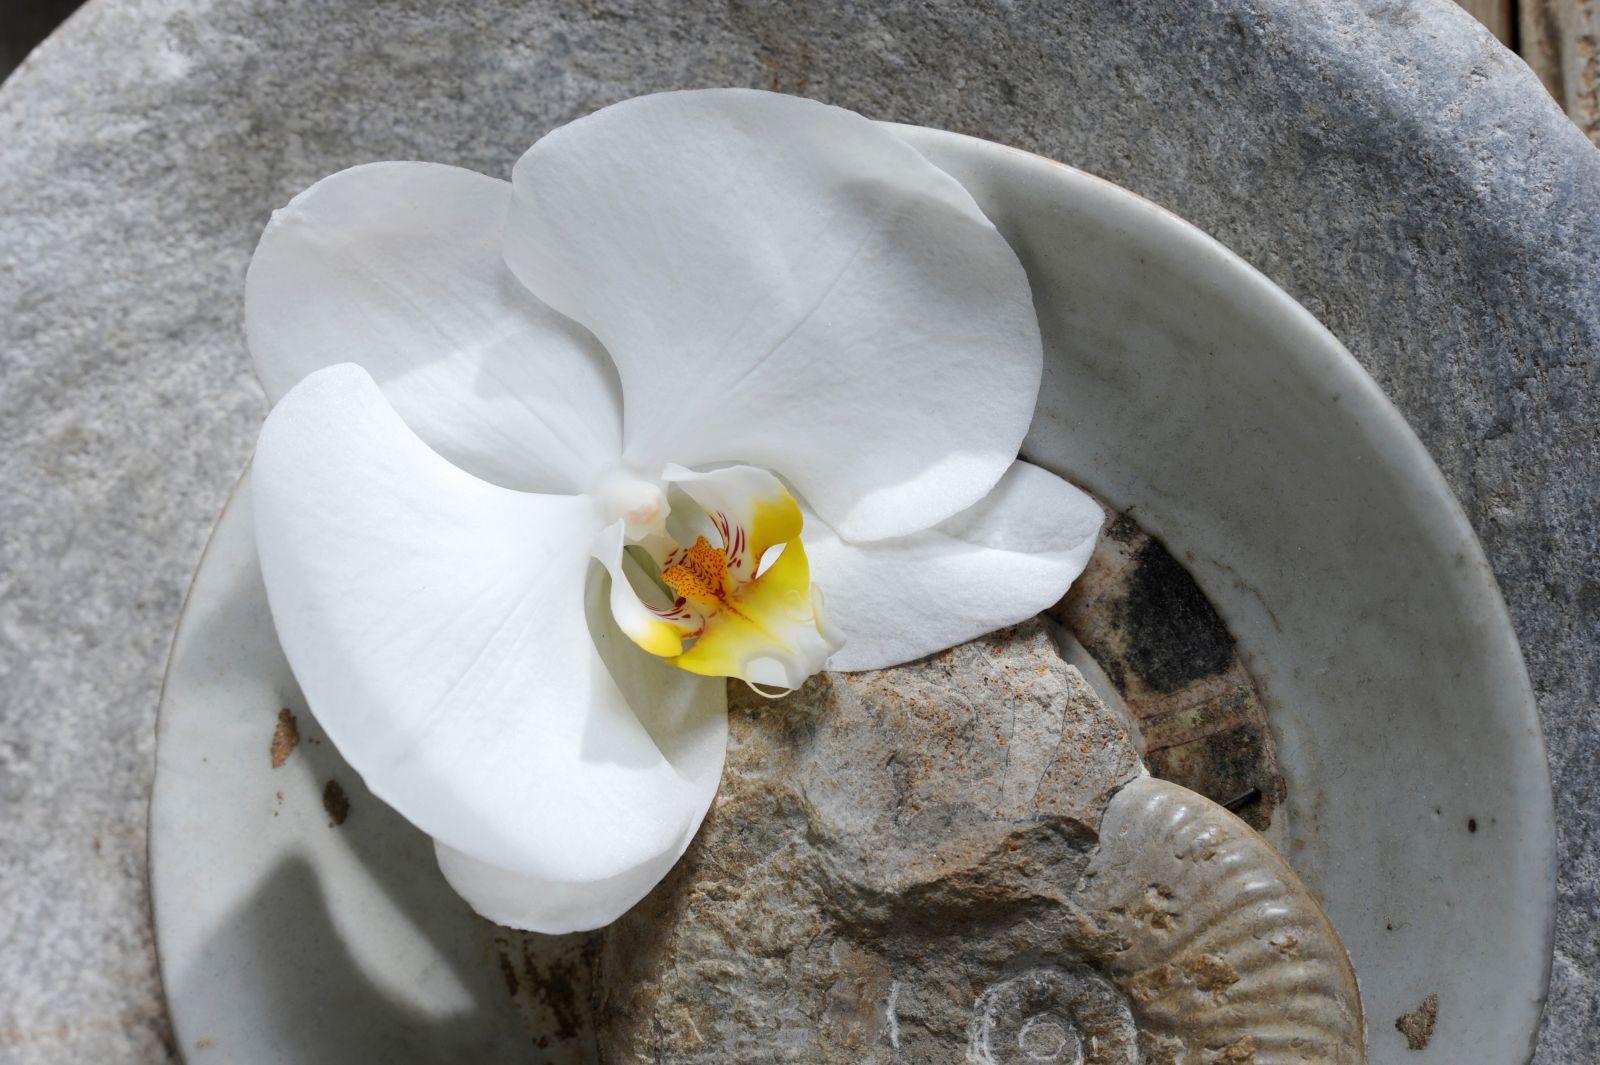 what does the phalaenopsis symbolize